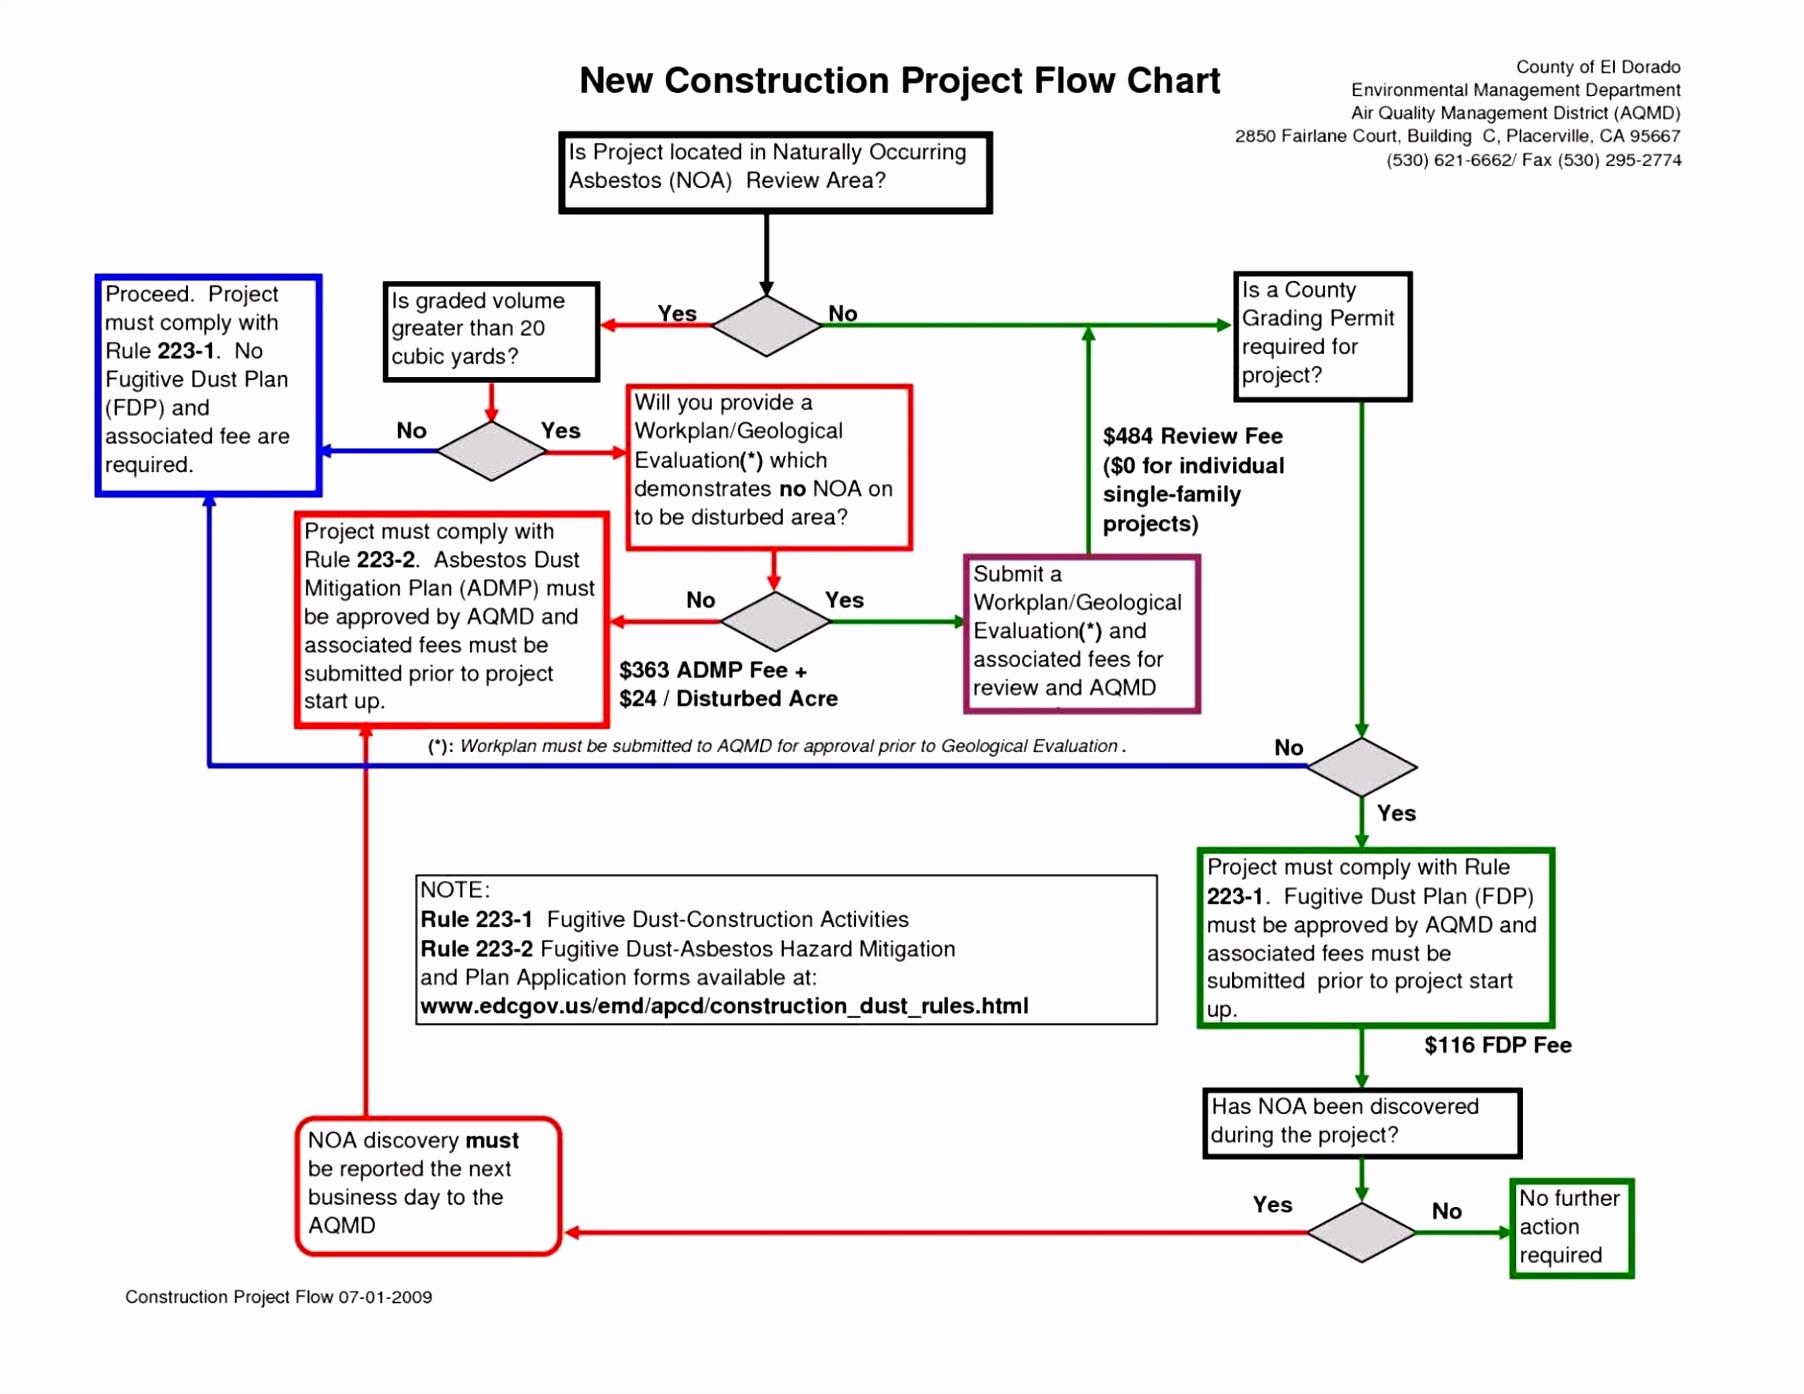 Flowchart Vorlage Call Flow Diagram — Daytonva150 Z3ot62gna6 U2vrmunfnu